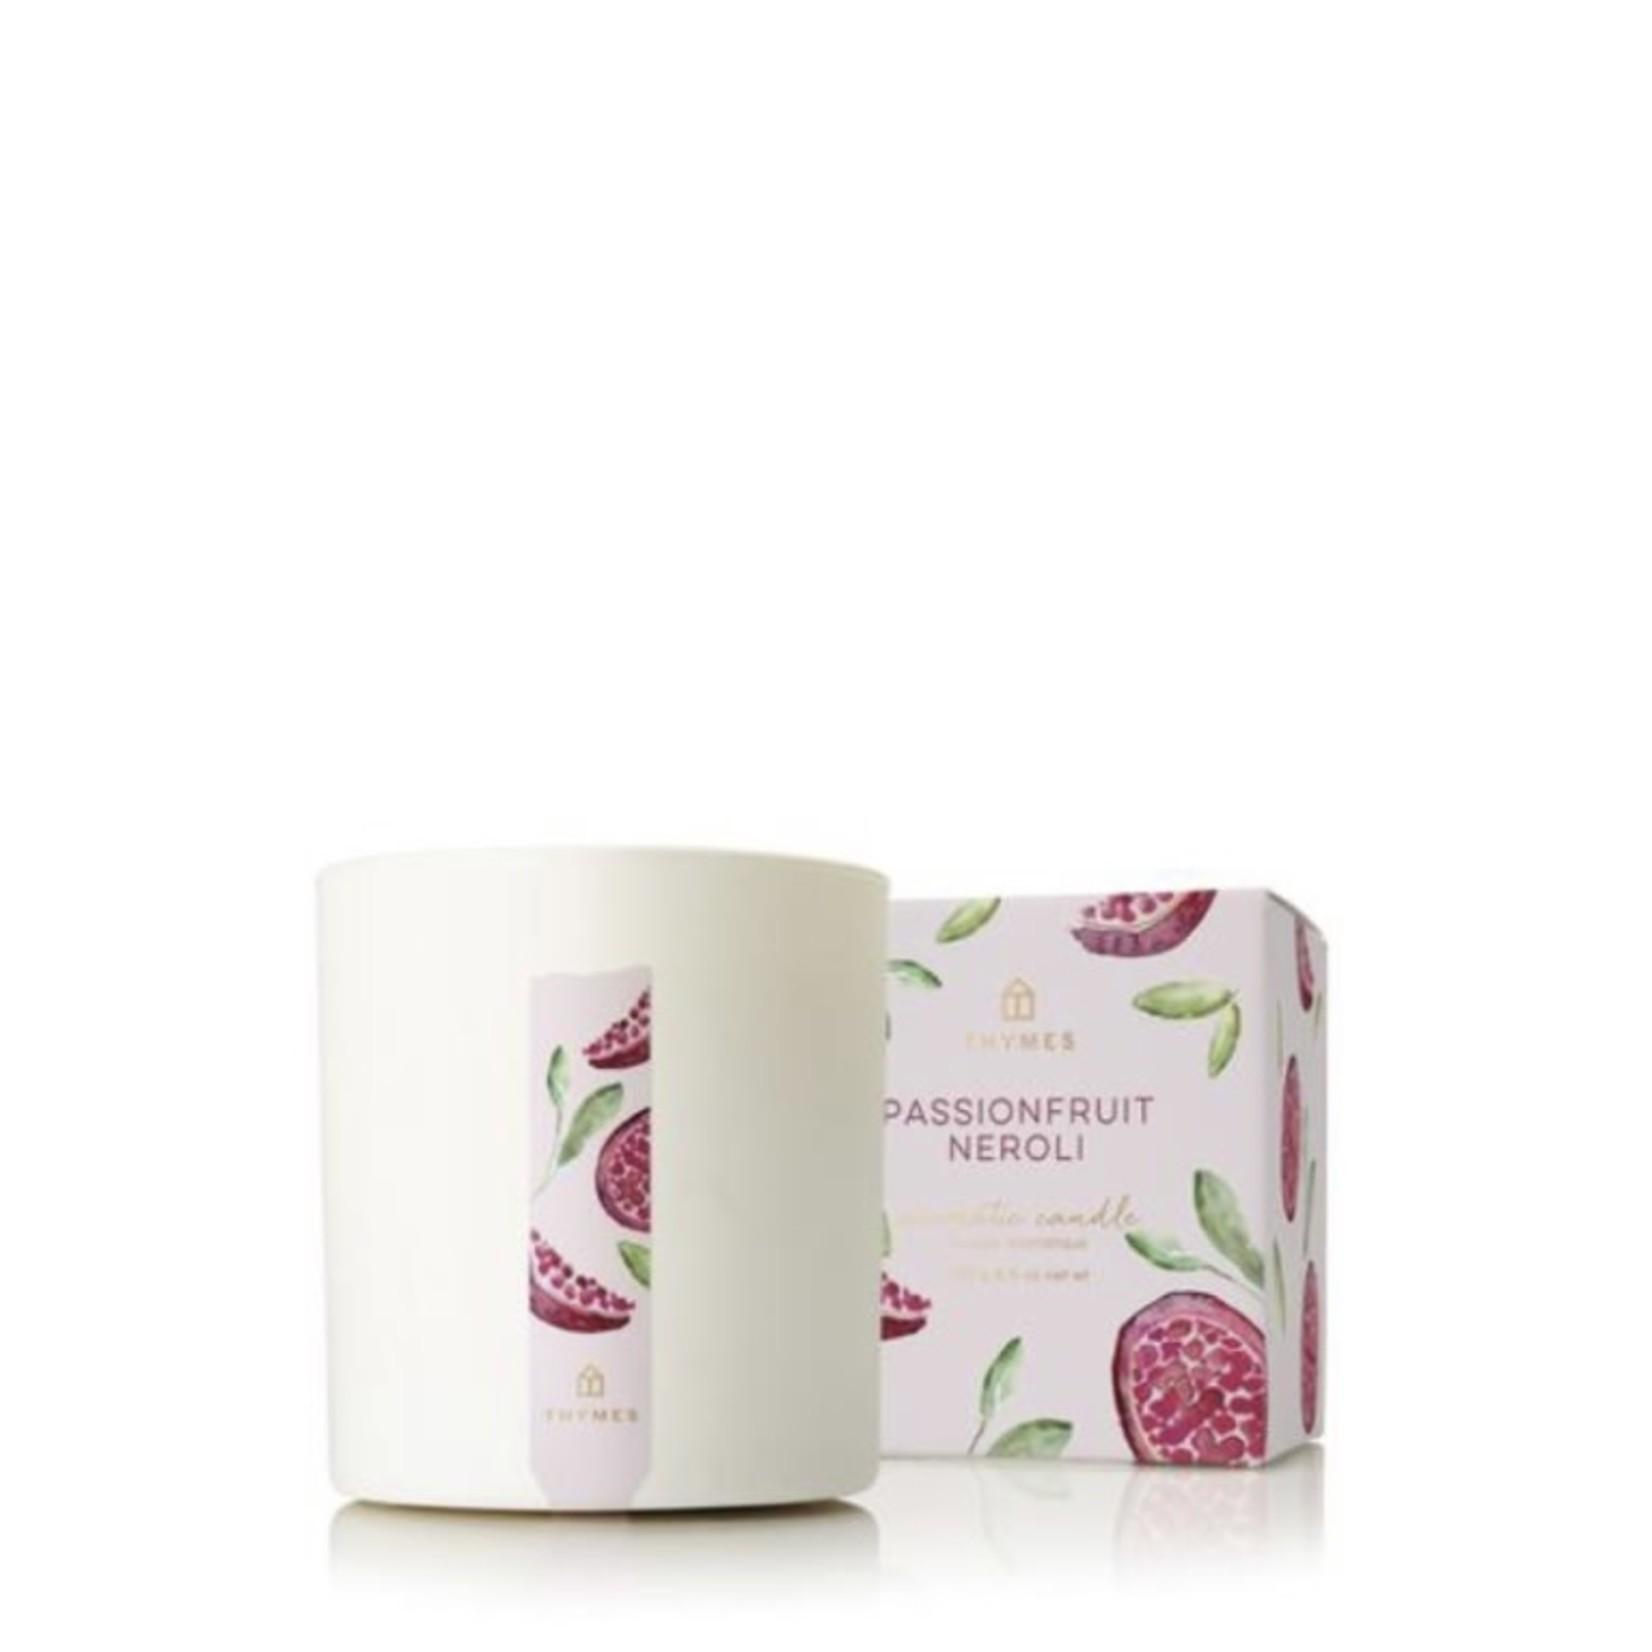 Thymes Passionfruit Neroli Aromatic Candle